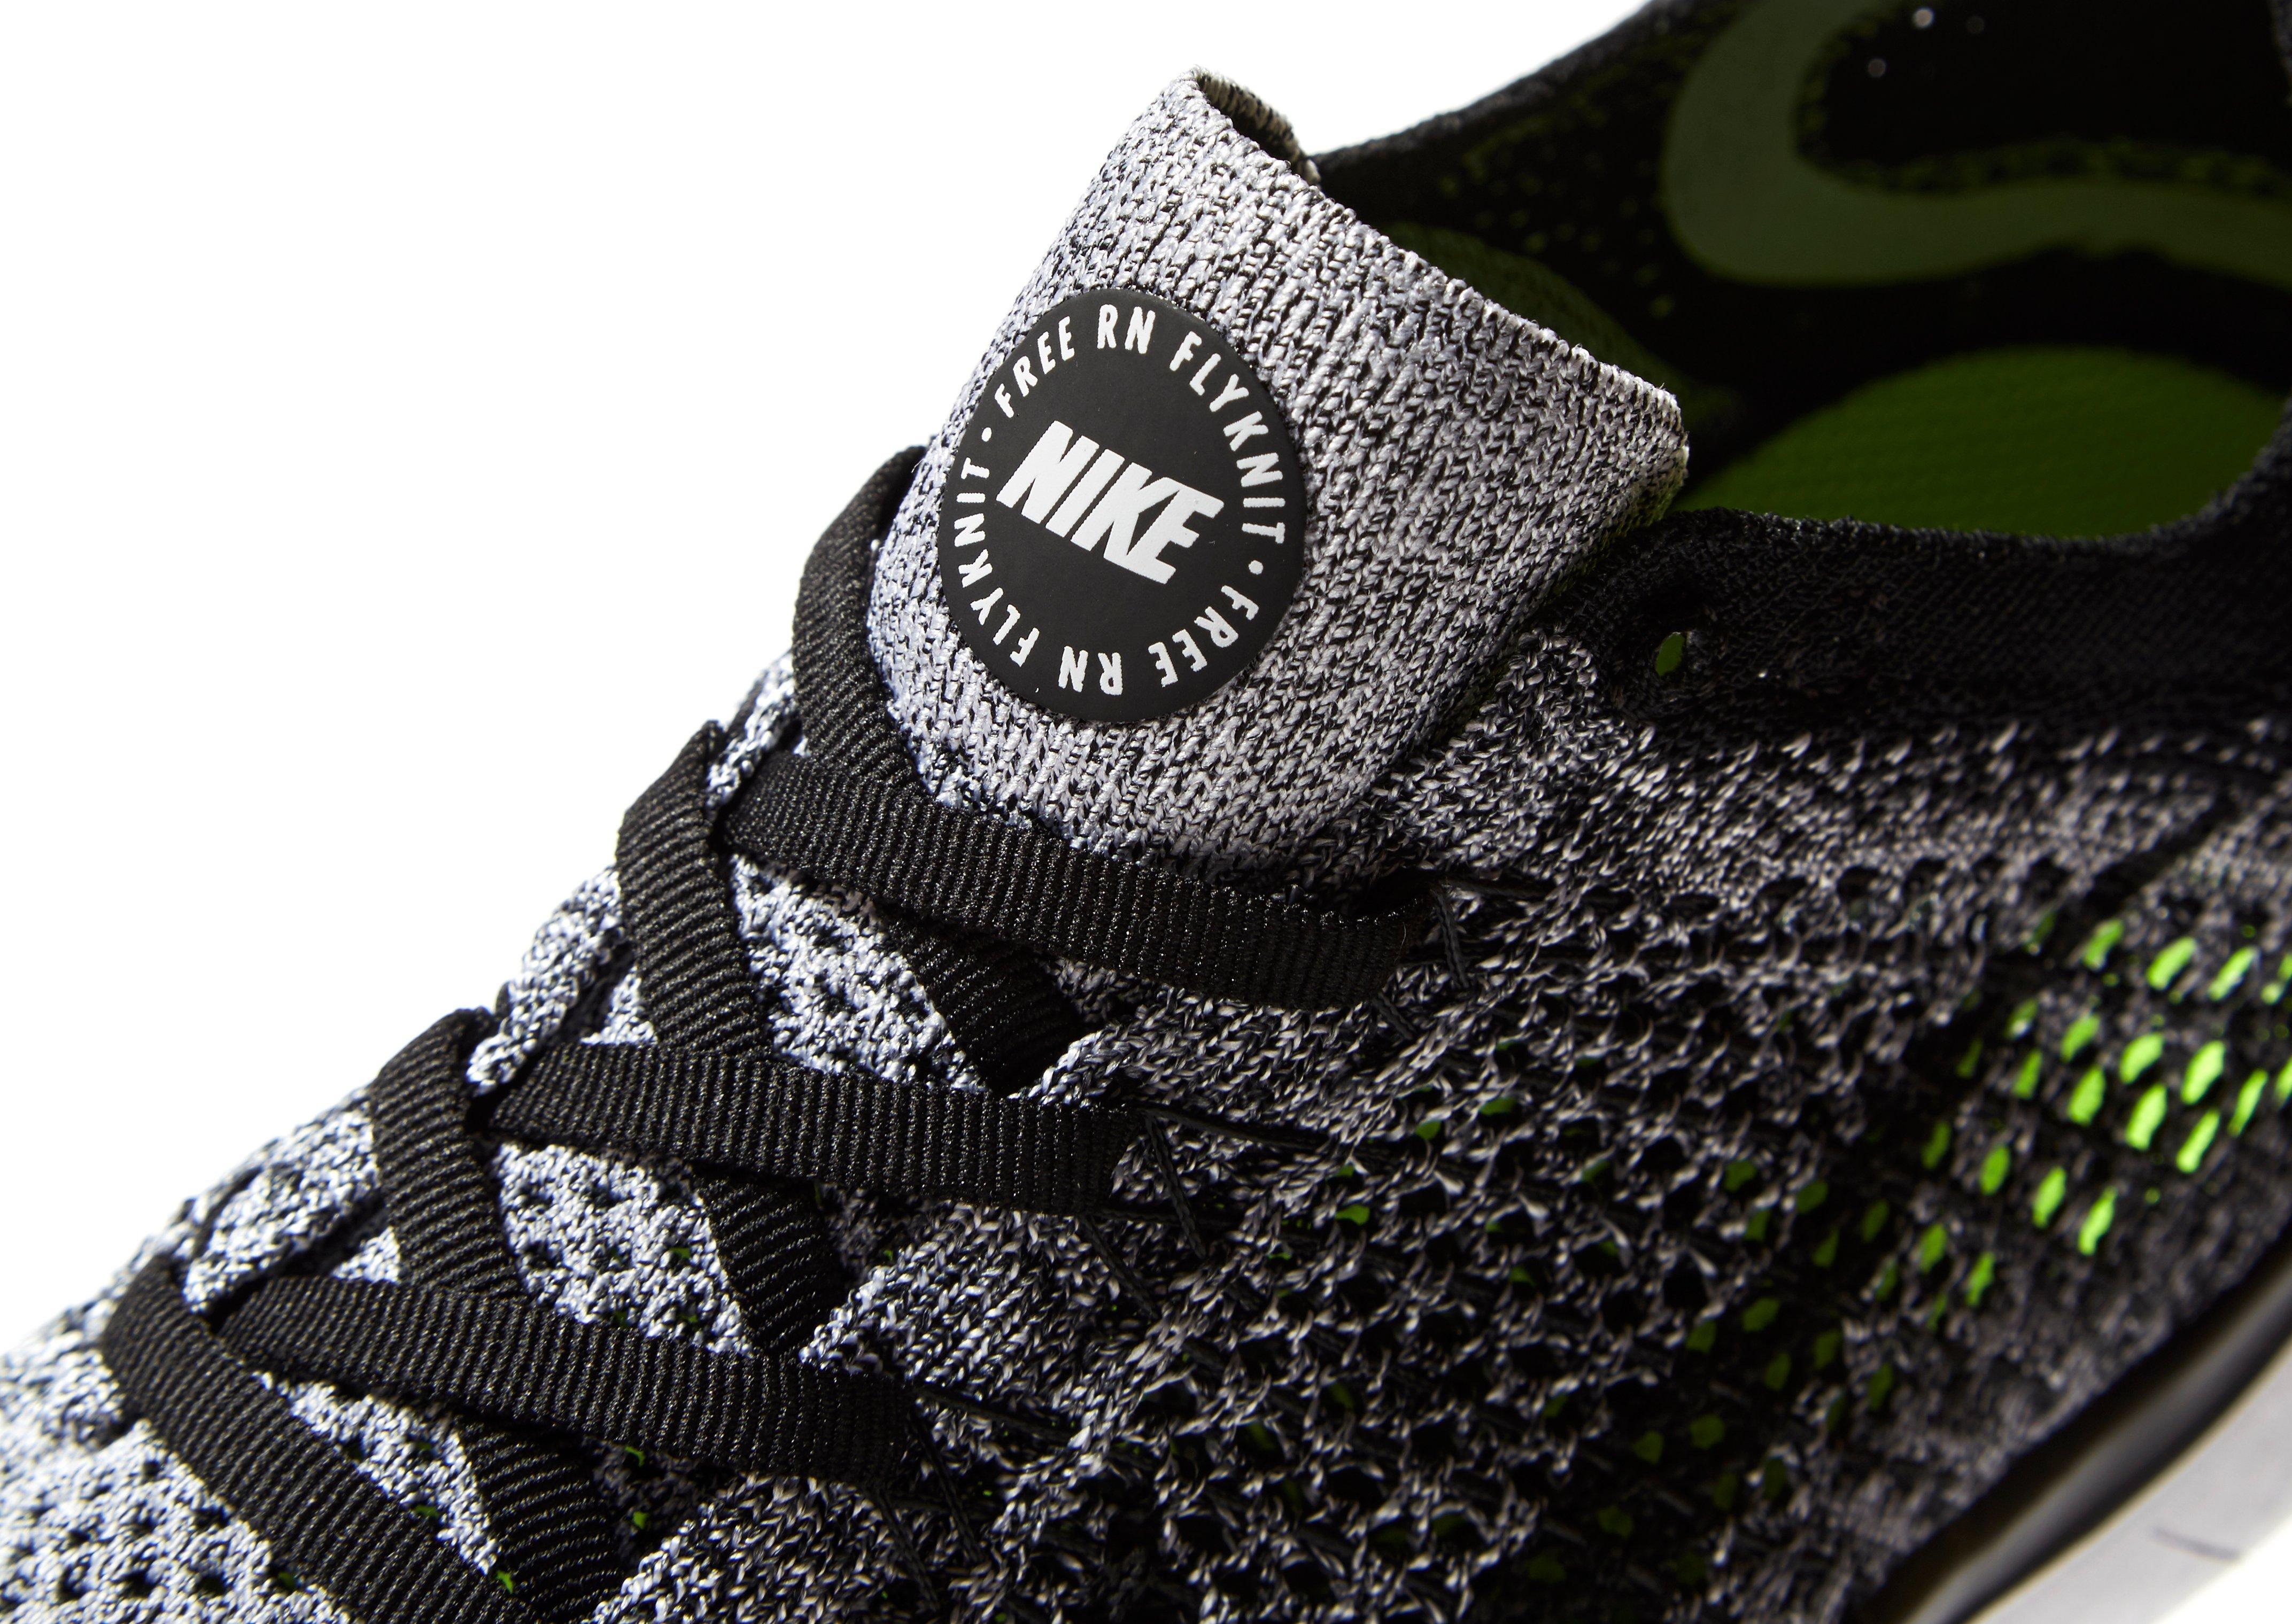 981ad00a8c4c2 Nike Dunk Custom Shoes Soccer Shoes | HopShopGo